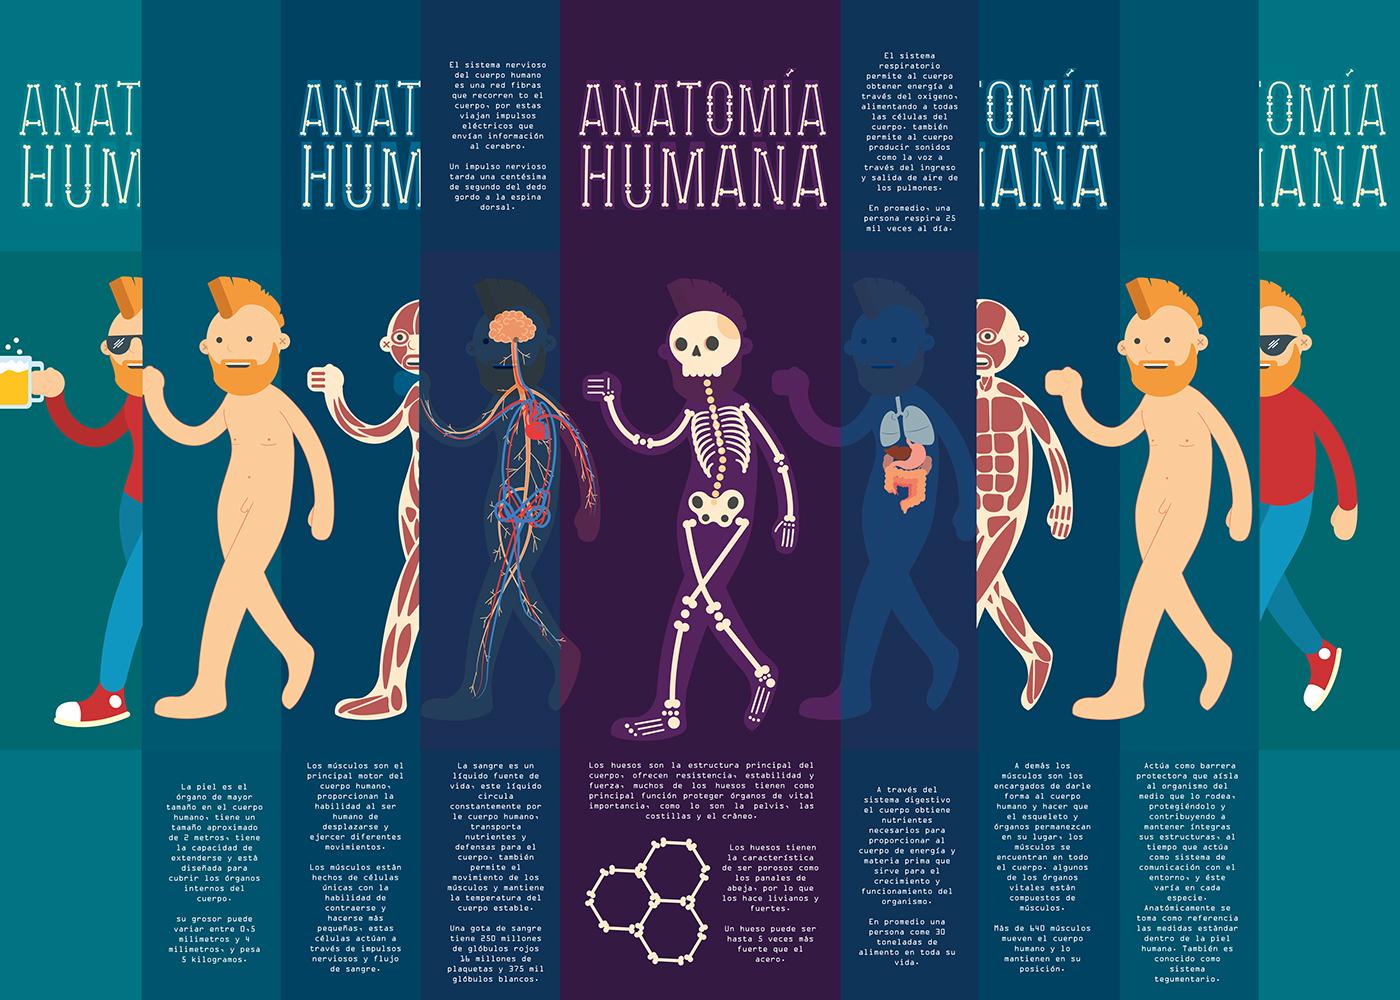 Anatomía Humana - infografía on Behance